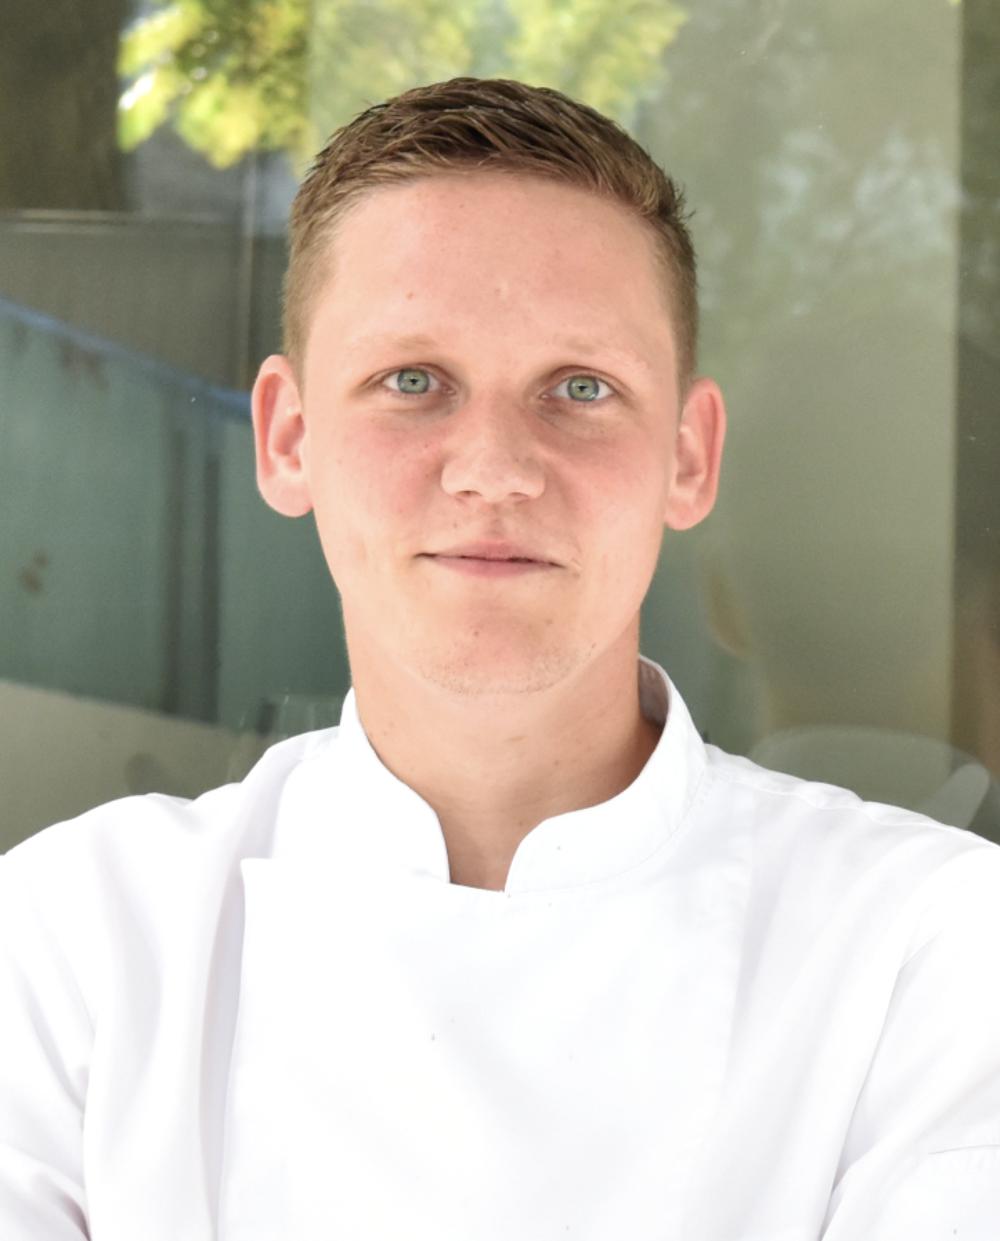 Foto Benjamin GOEDBLOED: Chef